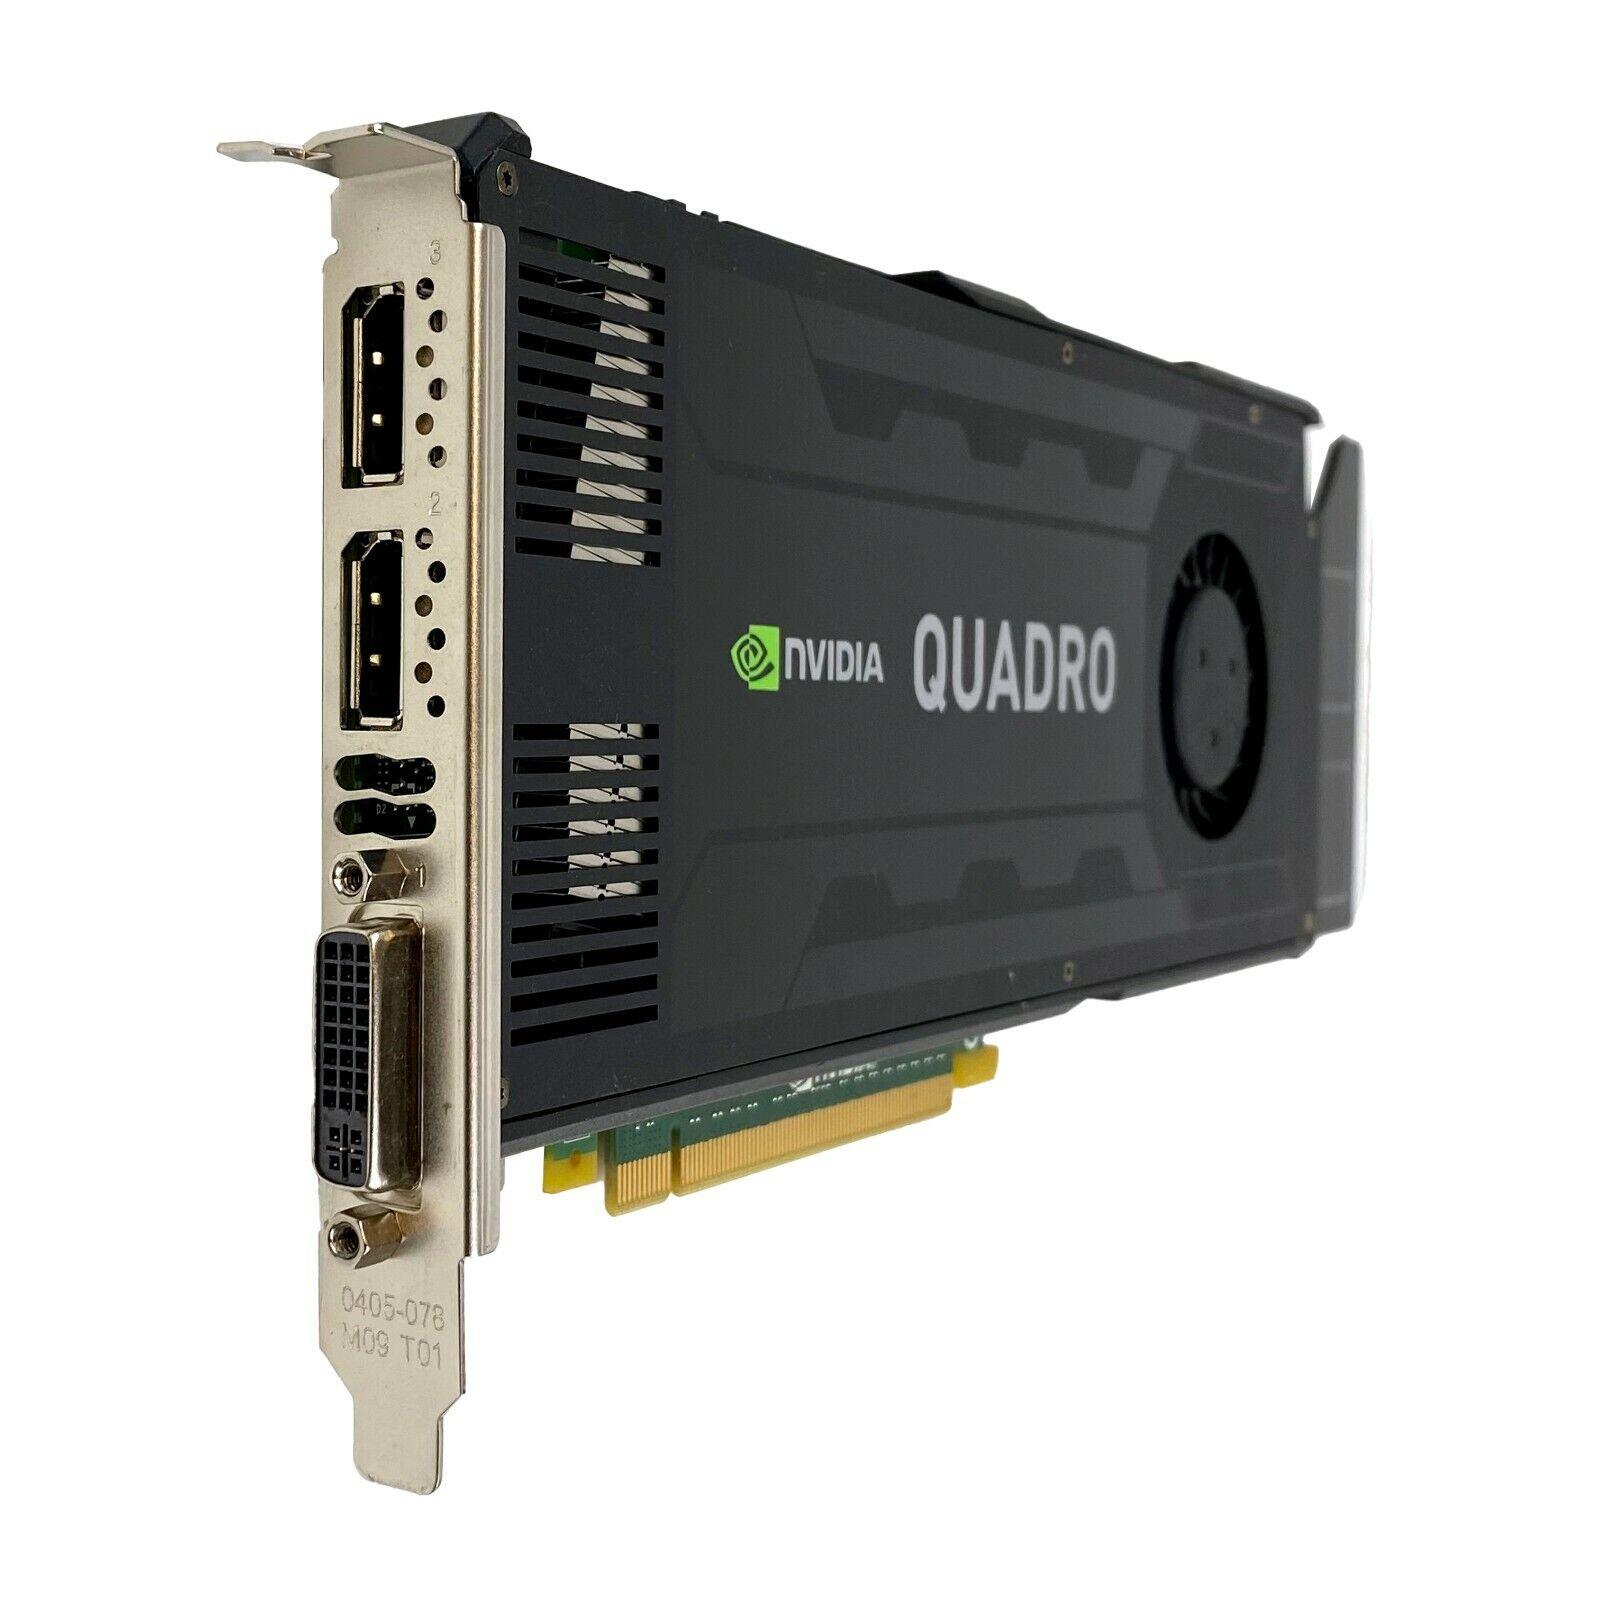 Nvidia Geforce Gtx 660 1 5gb Gddr5 Pci E X16 Desktop Video Graphics Card Fpdh3 For Sale Online Ebay